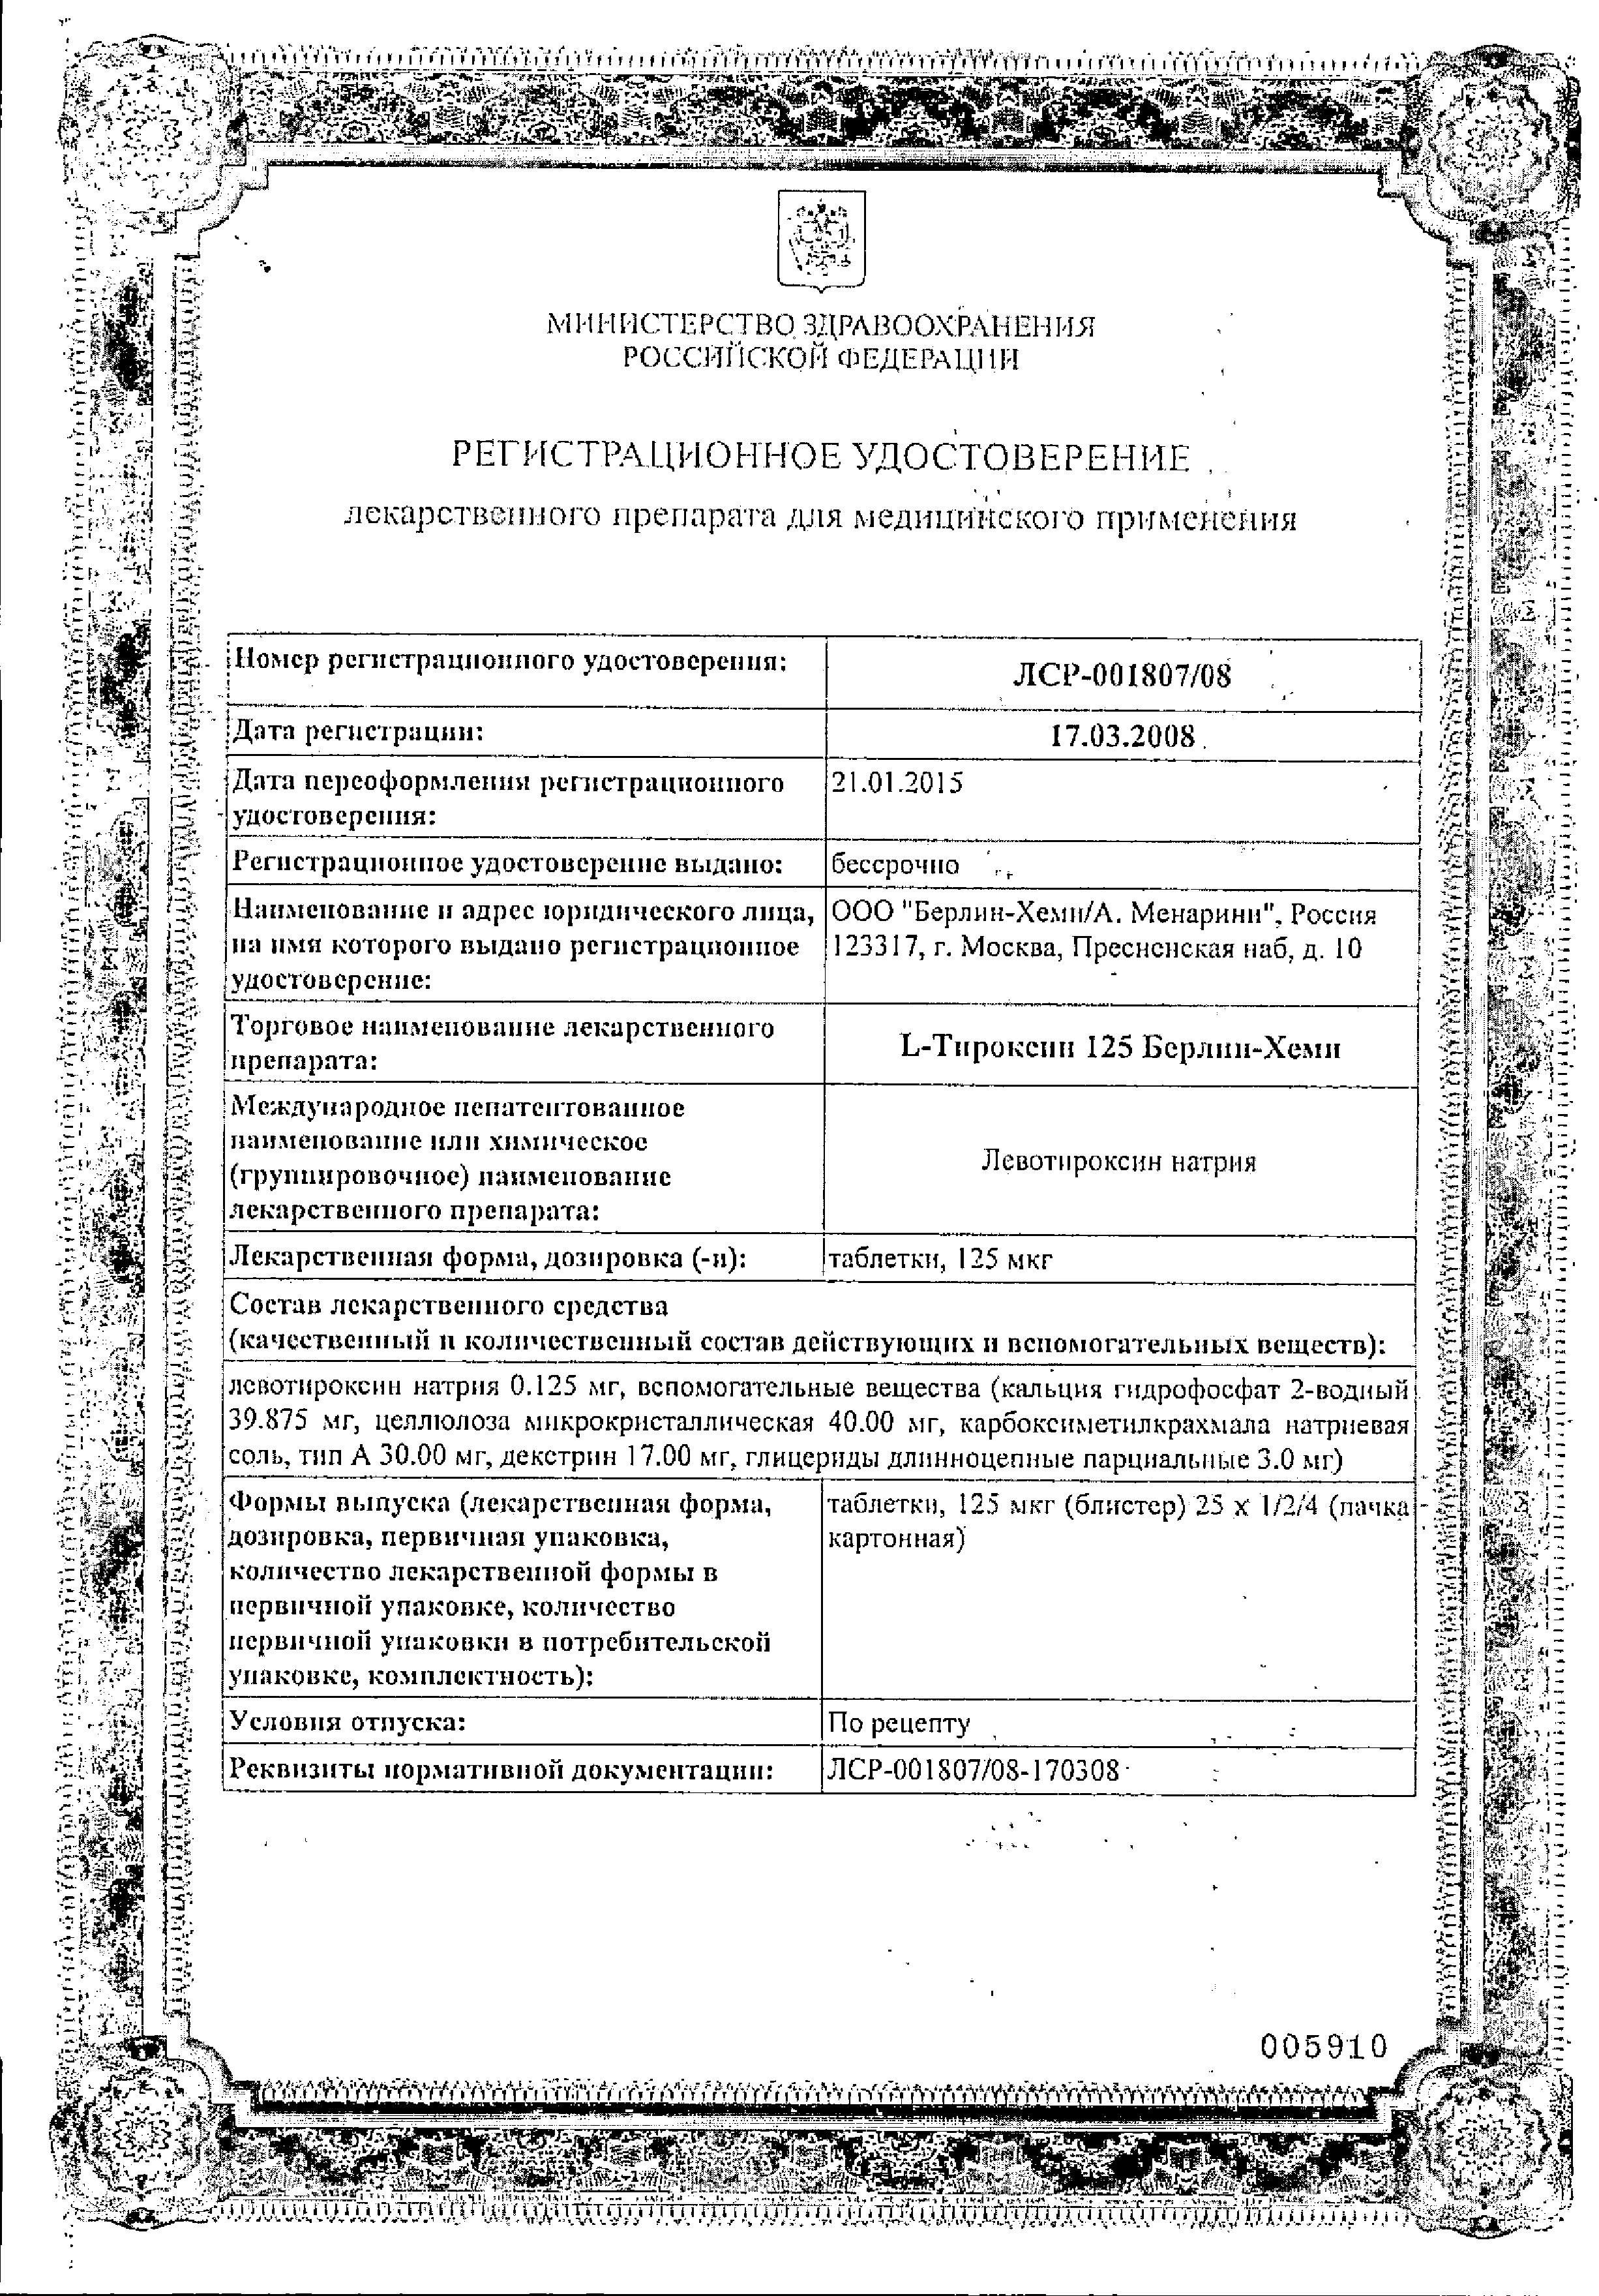 L-Тироксин 125 Берлин-Хеми сертификат